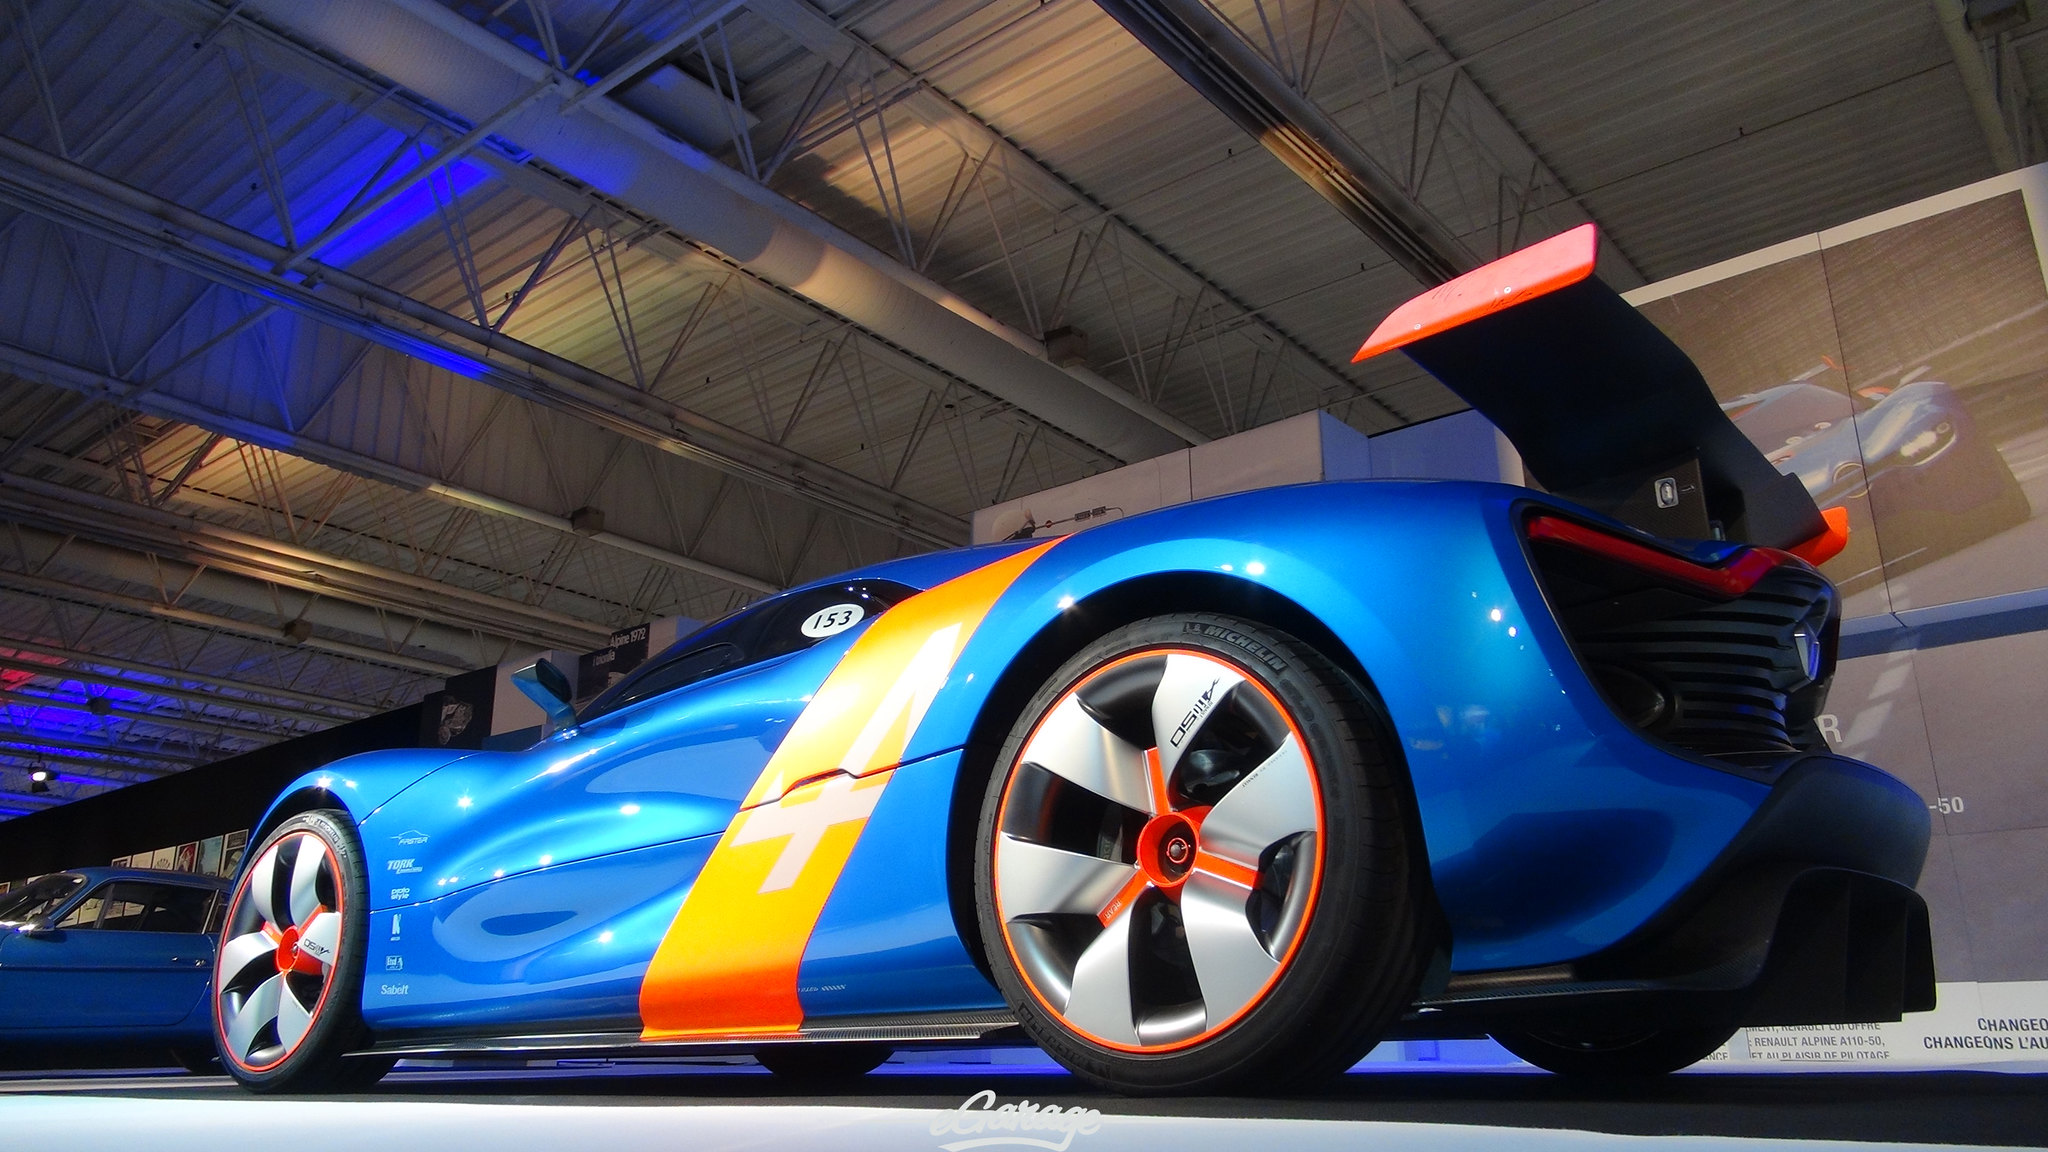 8037669026 1fc9cf25fe k 2012 Paris Motor Show